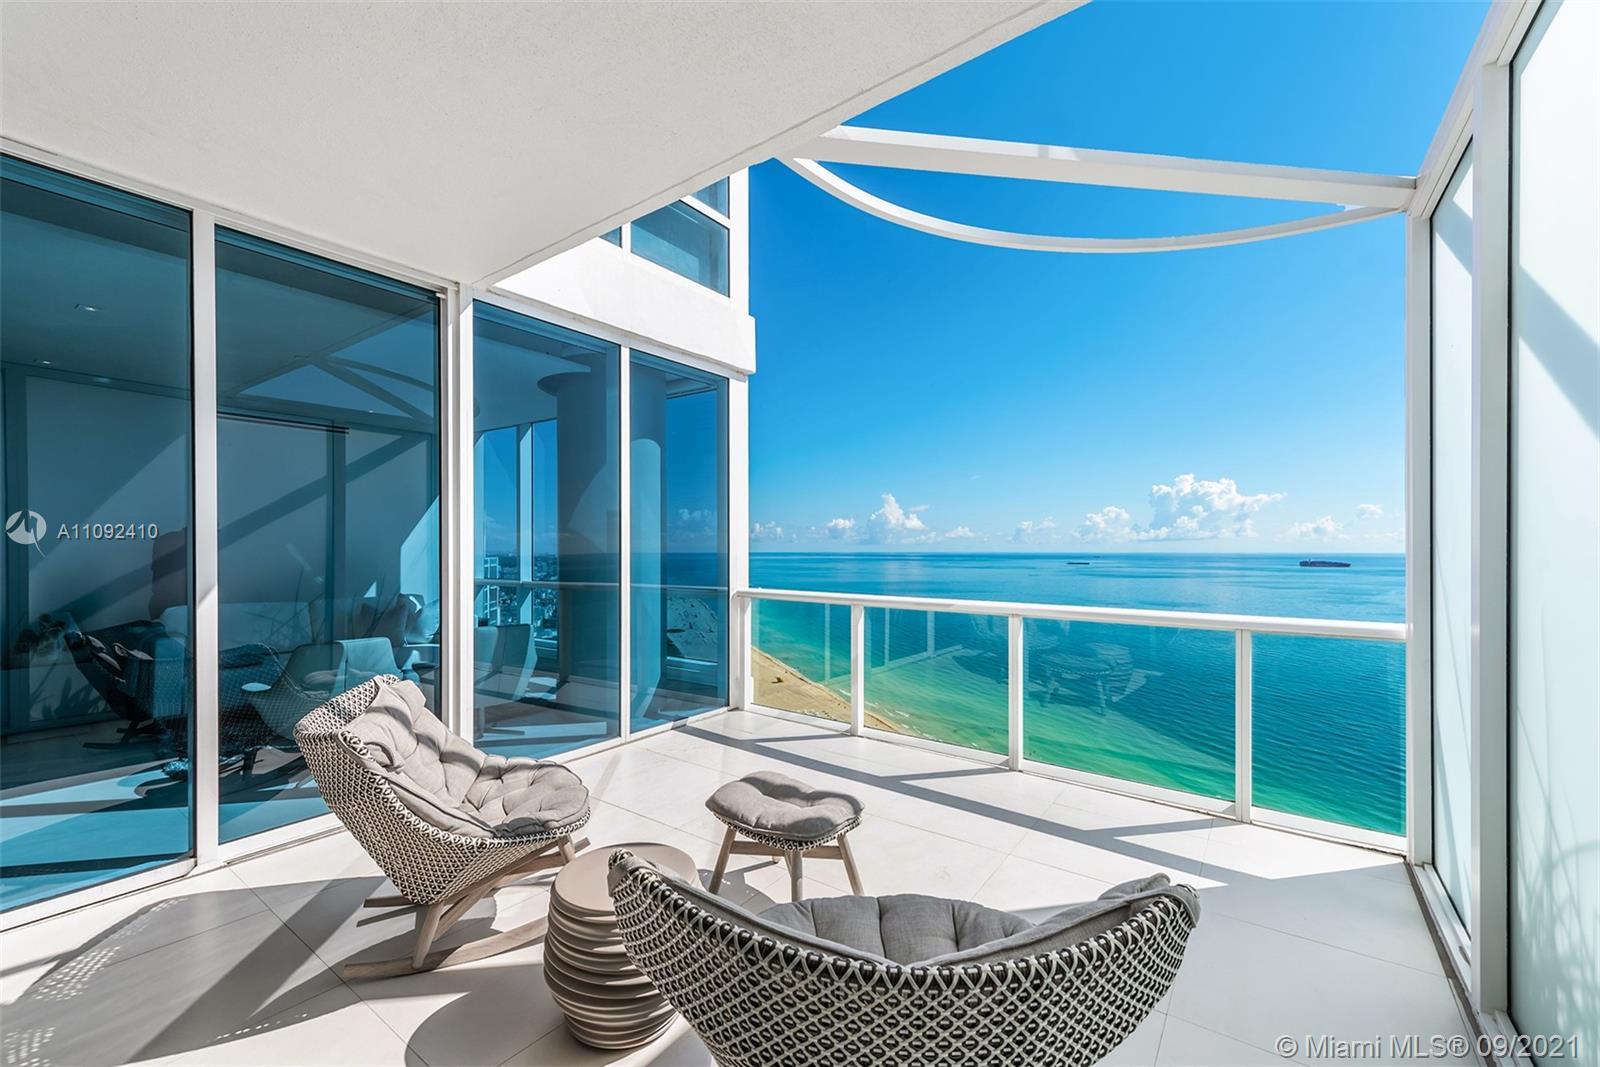 100 Pointe Dr Unit 3605, Miami Beach, Florida 33139